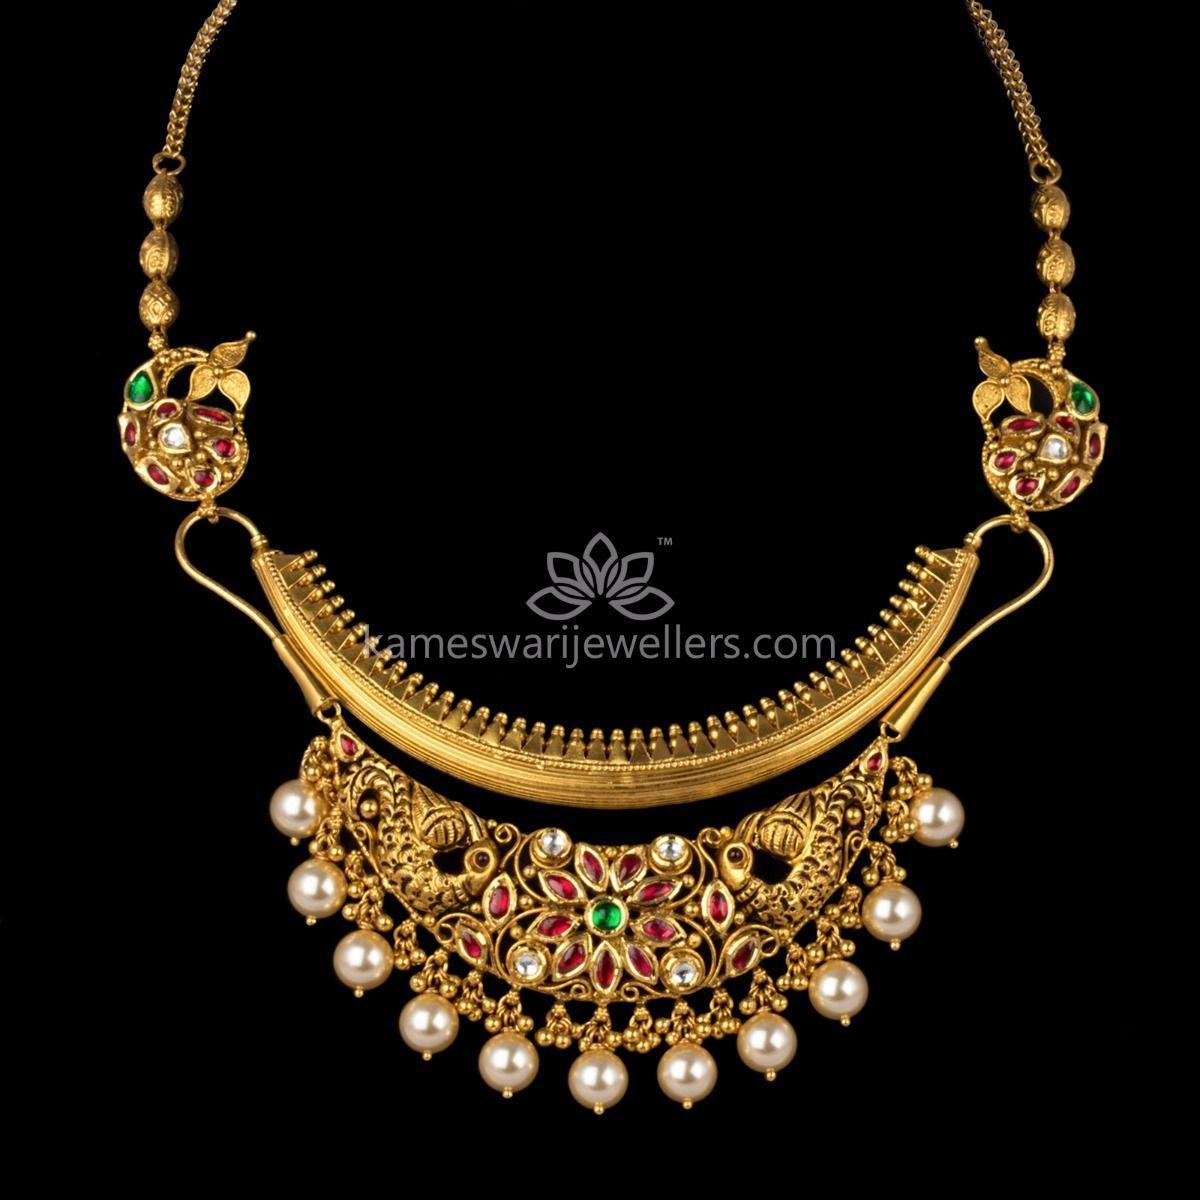 80ad2b9df0 Designer Luxuria | Kameswari jewellers | Gold jewelry, Necklace ...